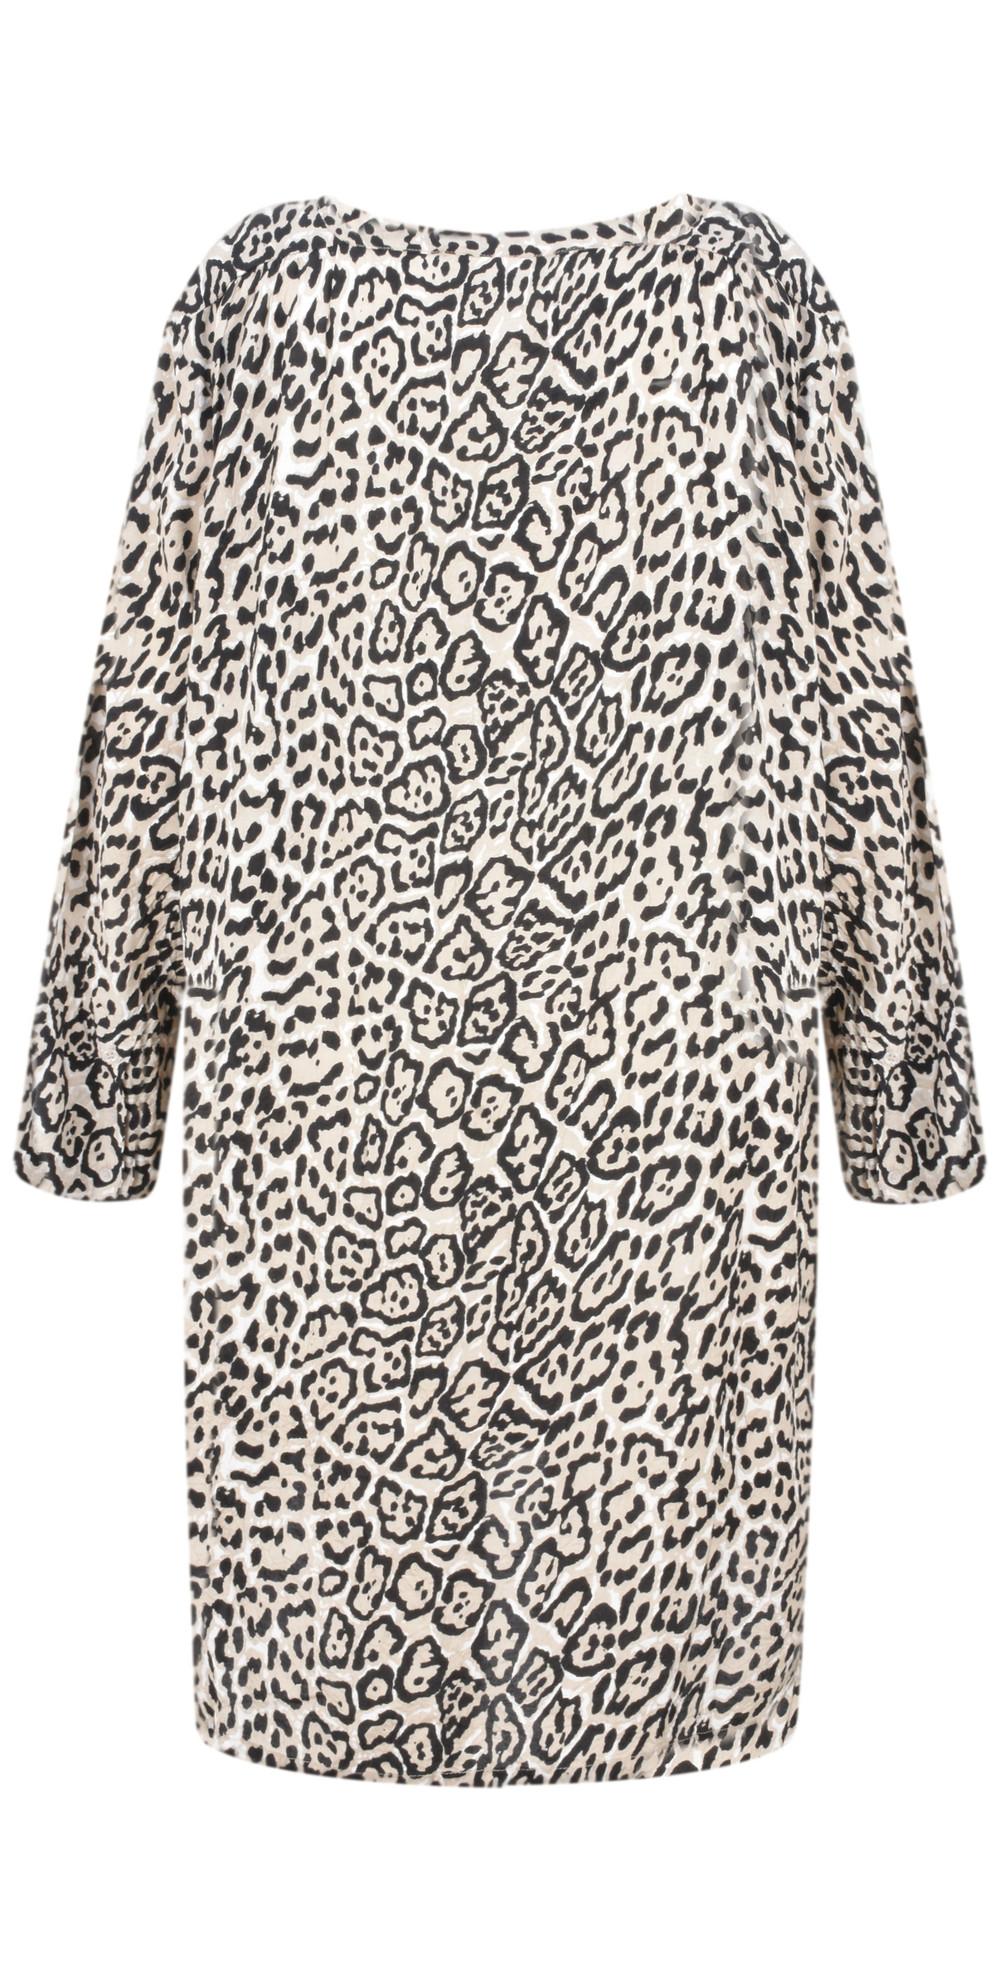 Genetta Leopard Tunic main image